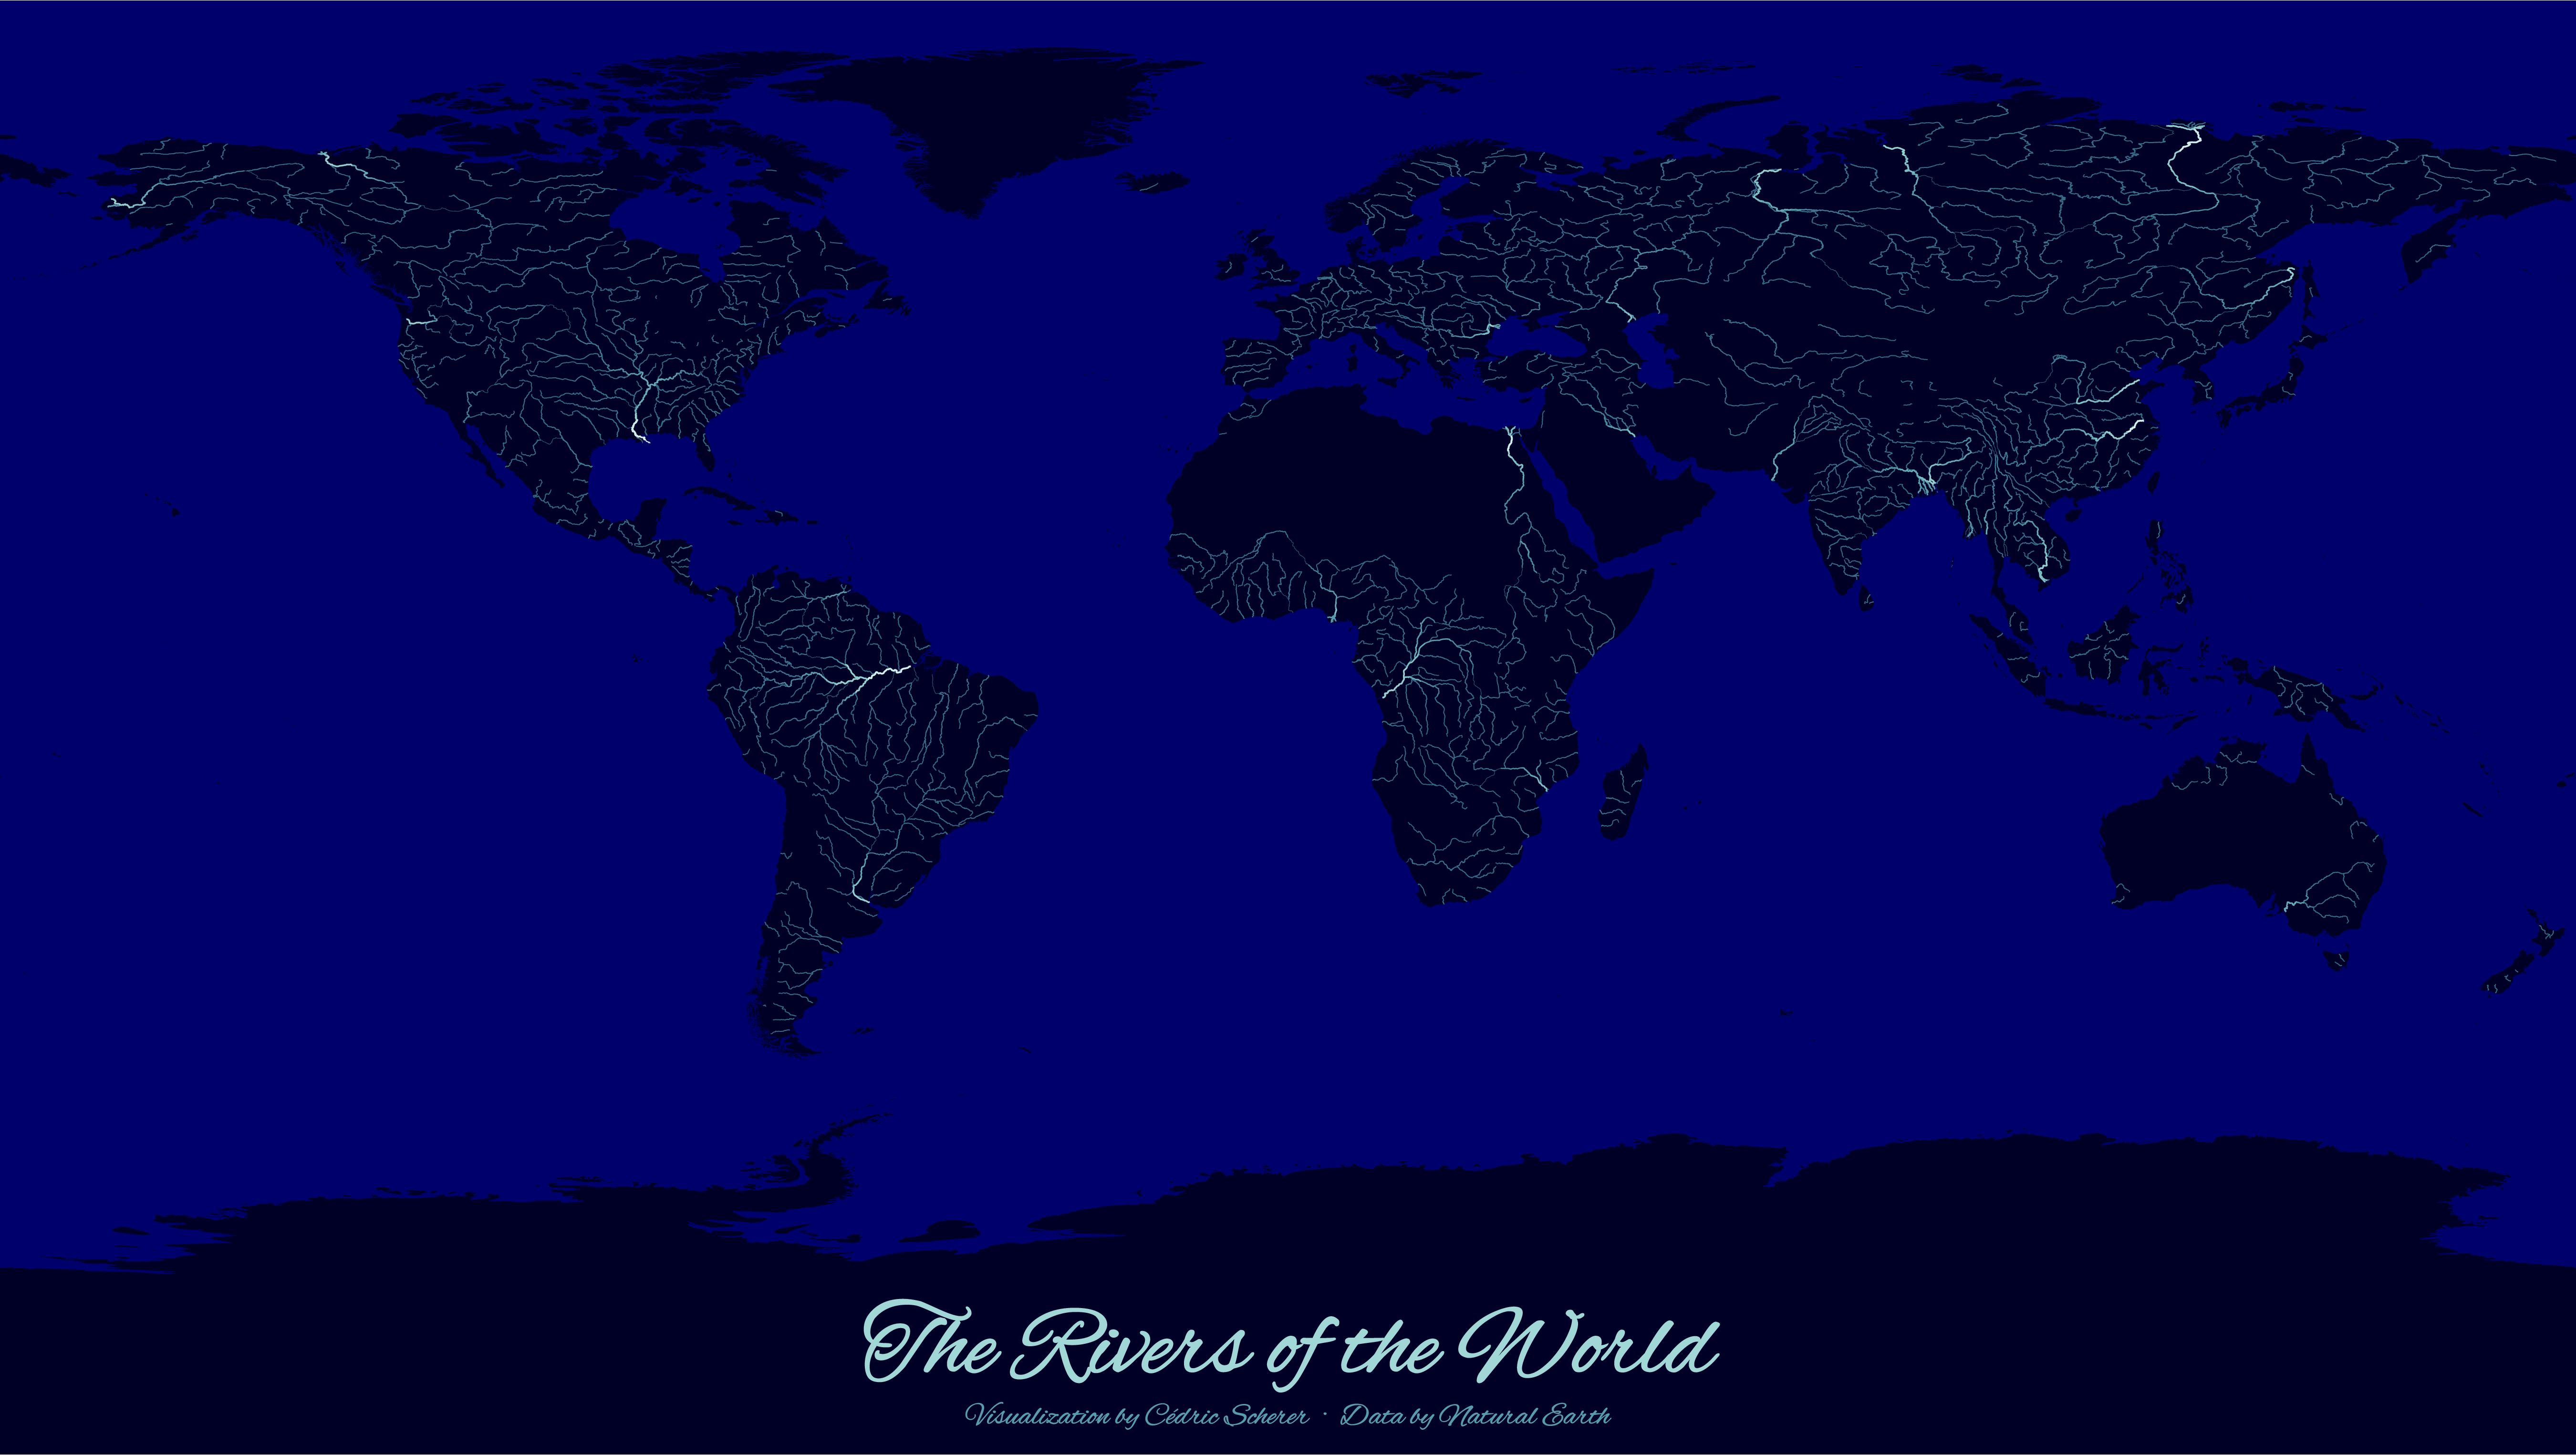 ./Day26_Hydrology/Hydrology_WorldRivers.png